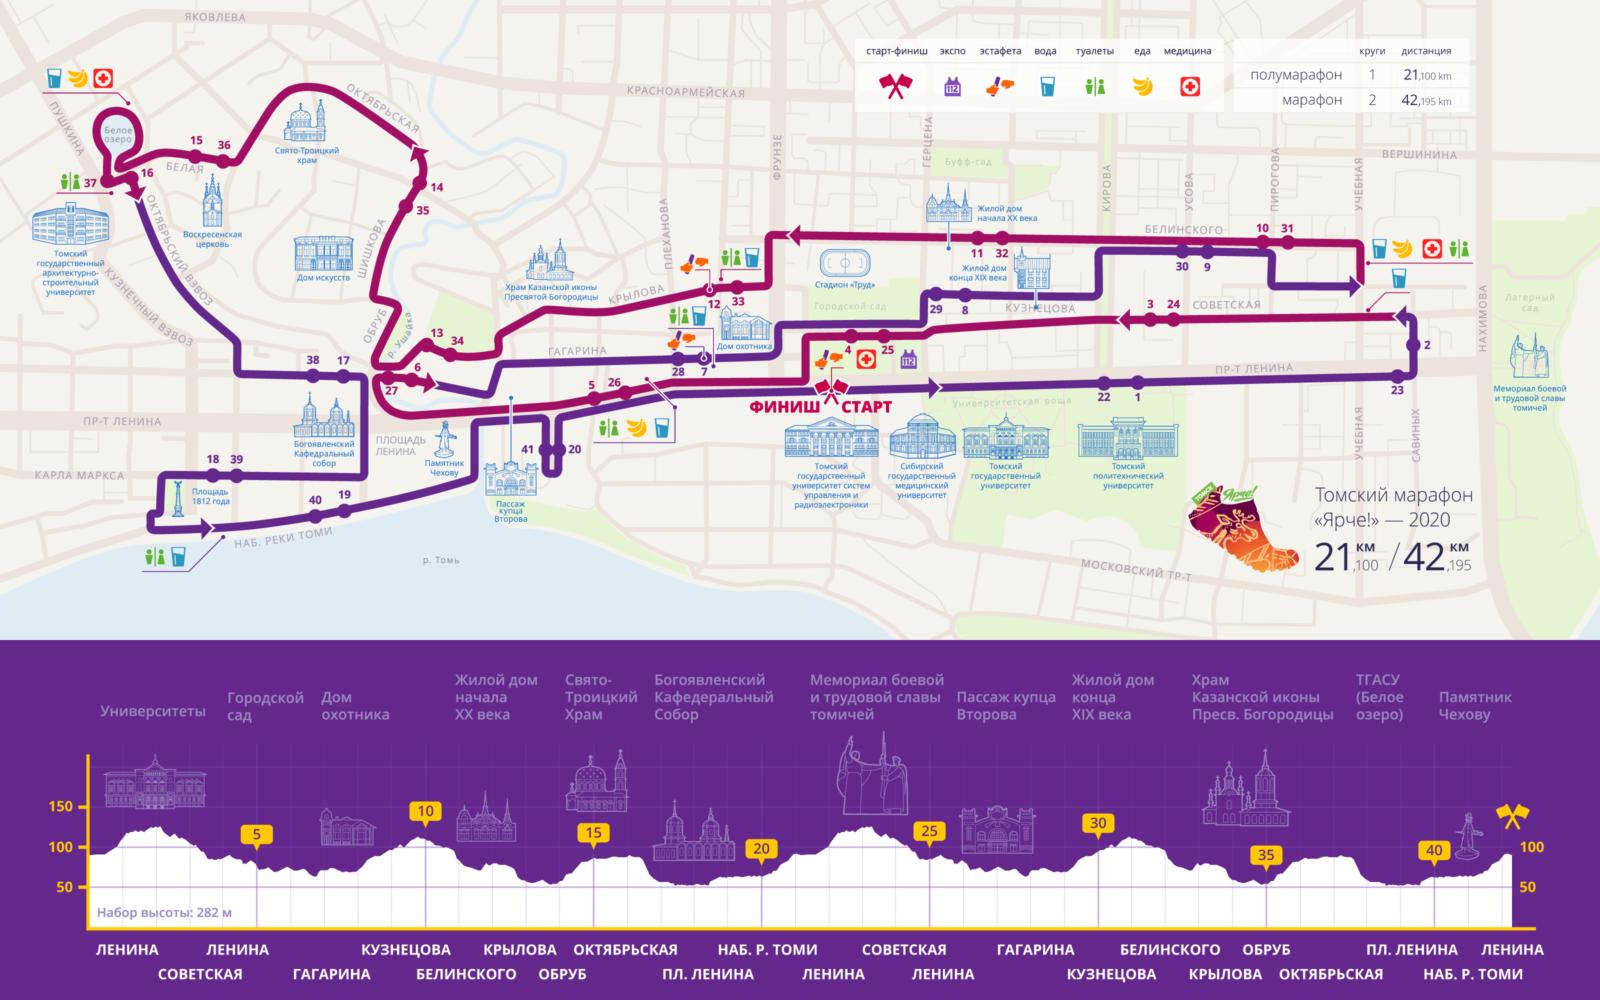 tomsk marathon